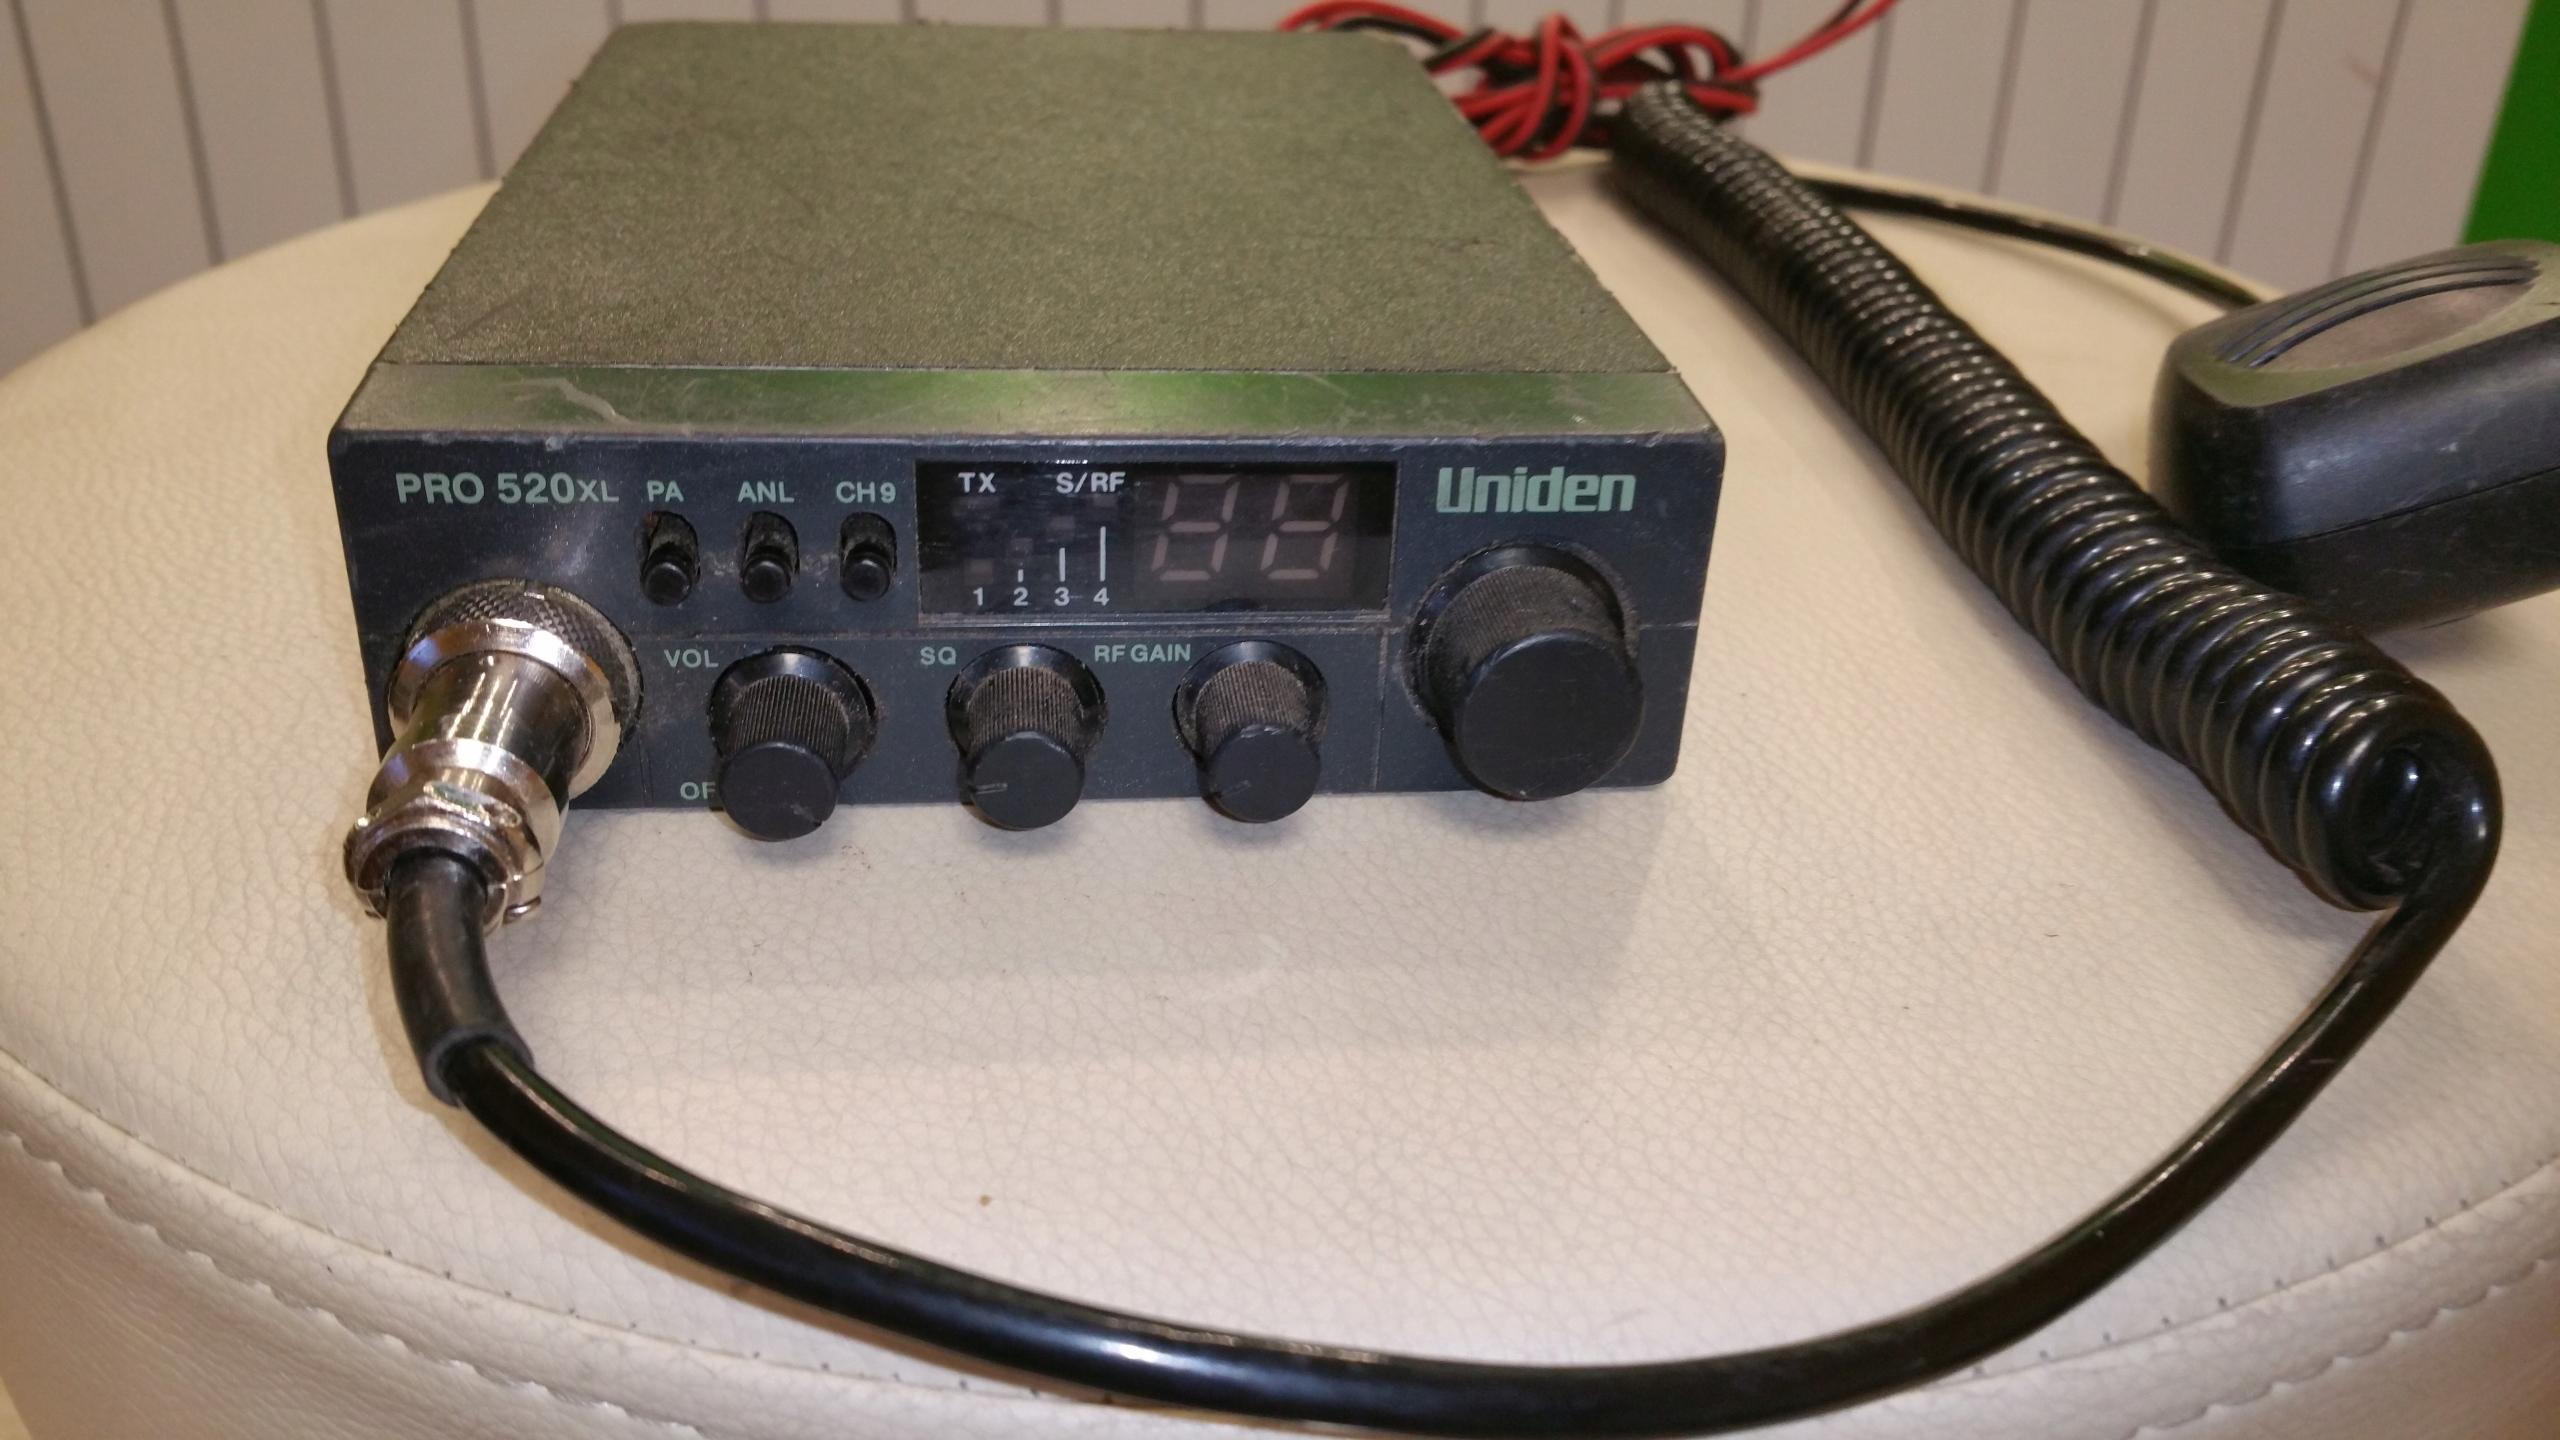 UNIDEN PRO 520 XL CB-RADIO SPRAWNE W 100% + GRUCHA